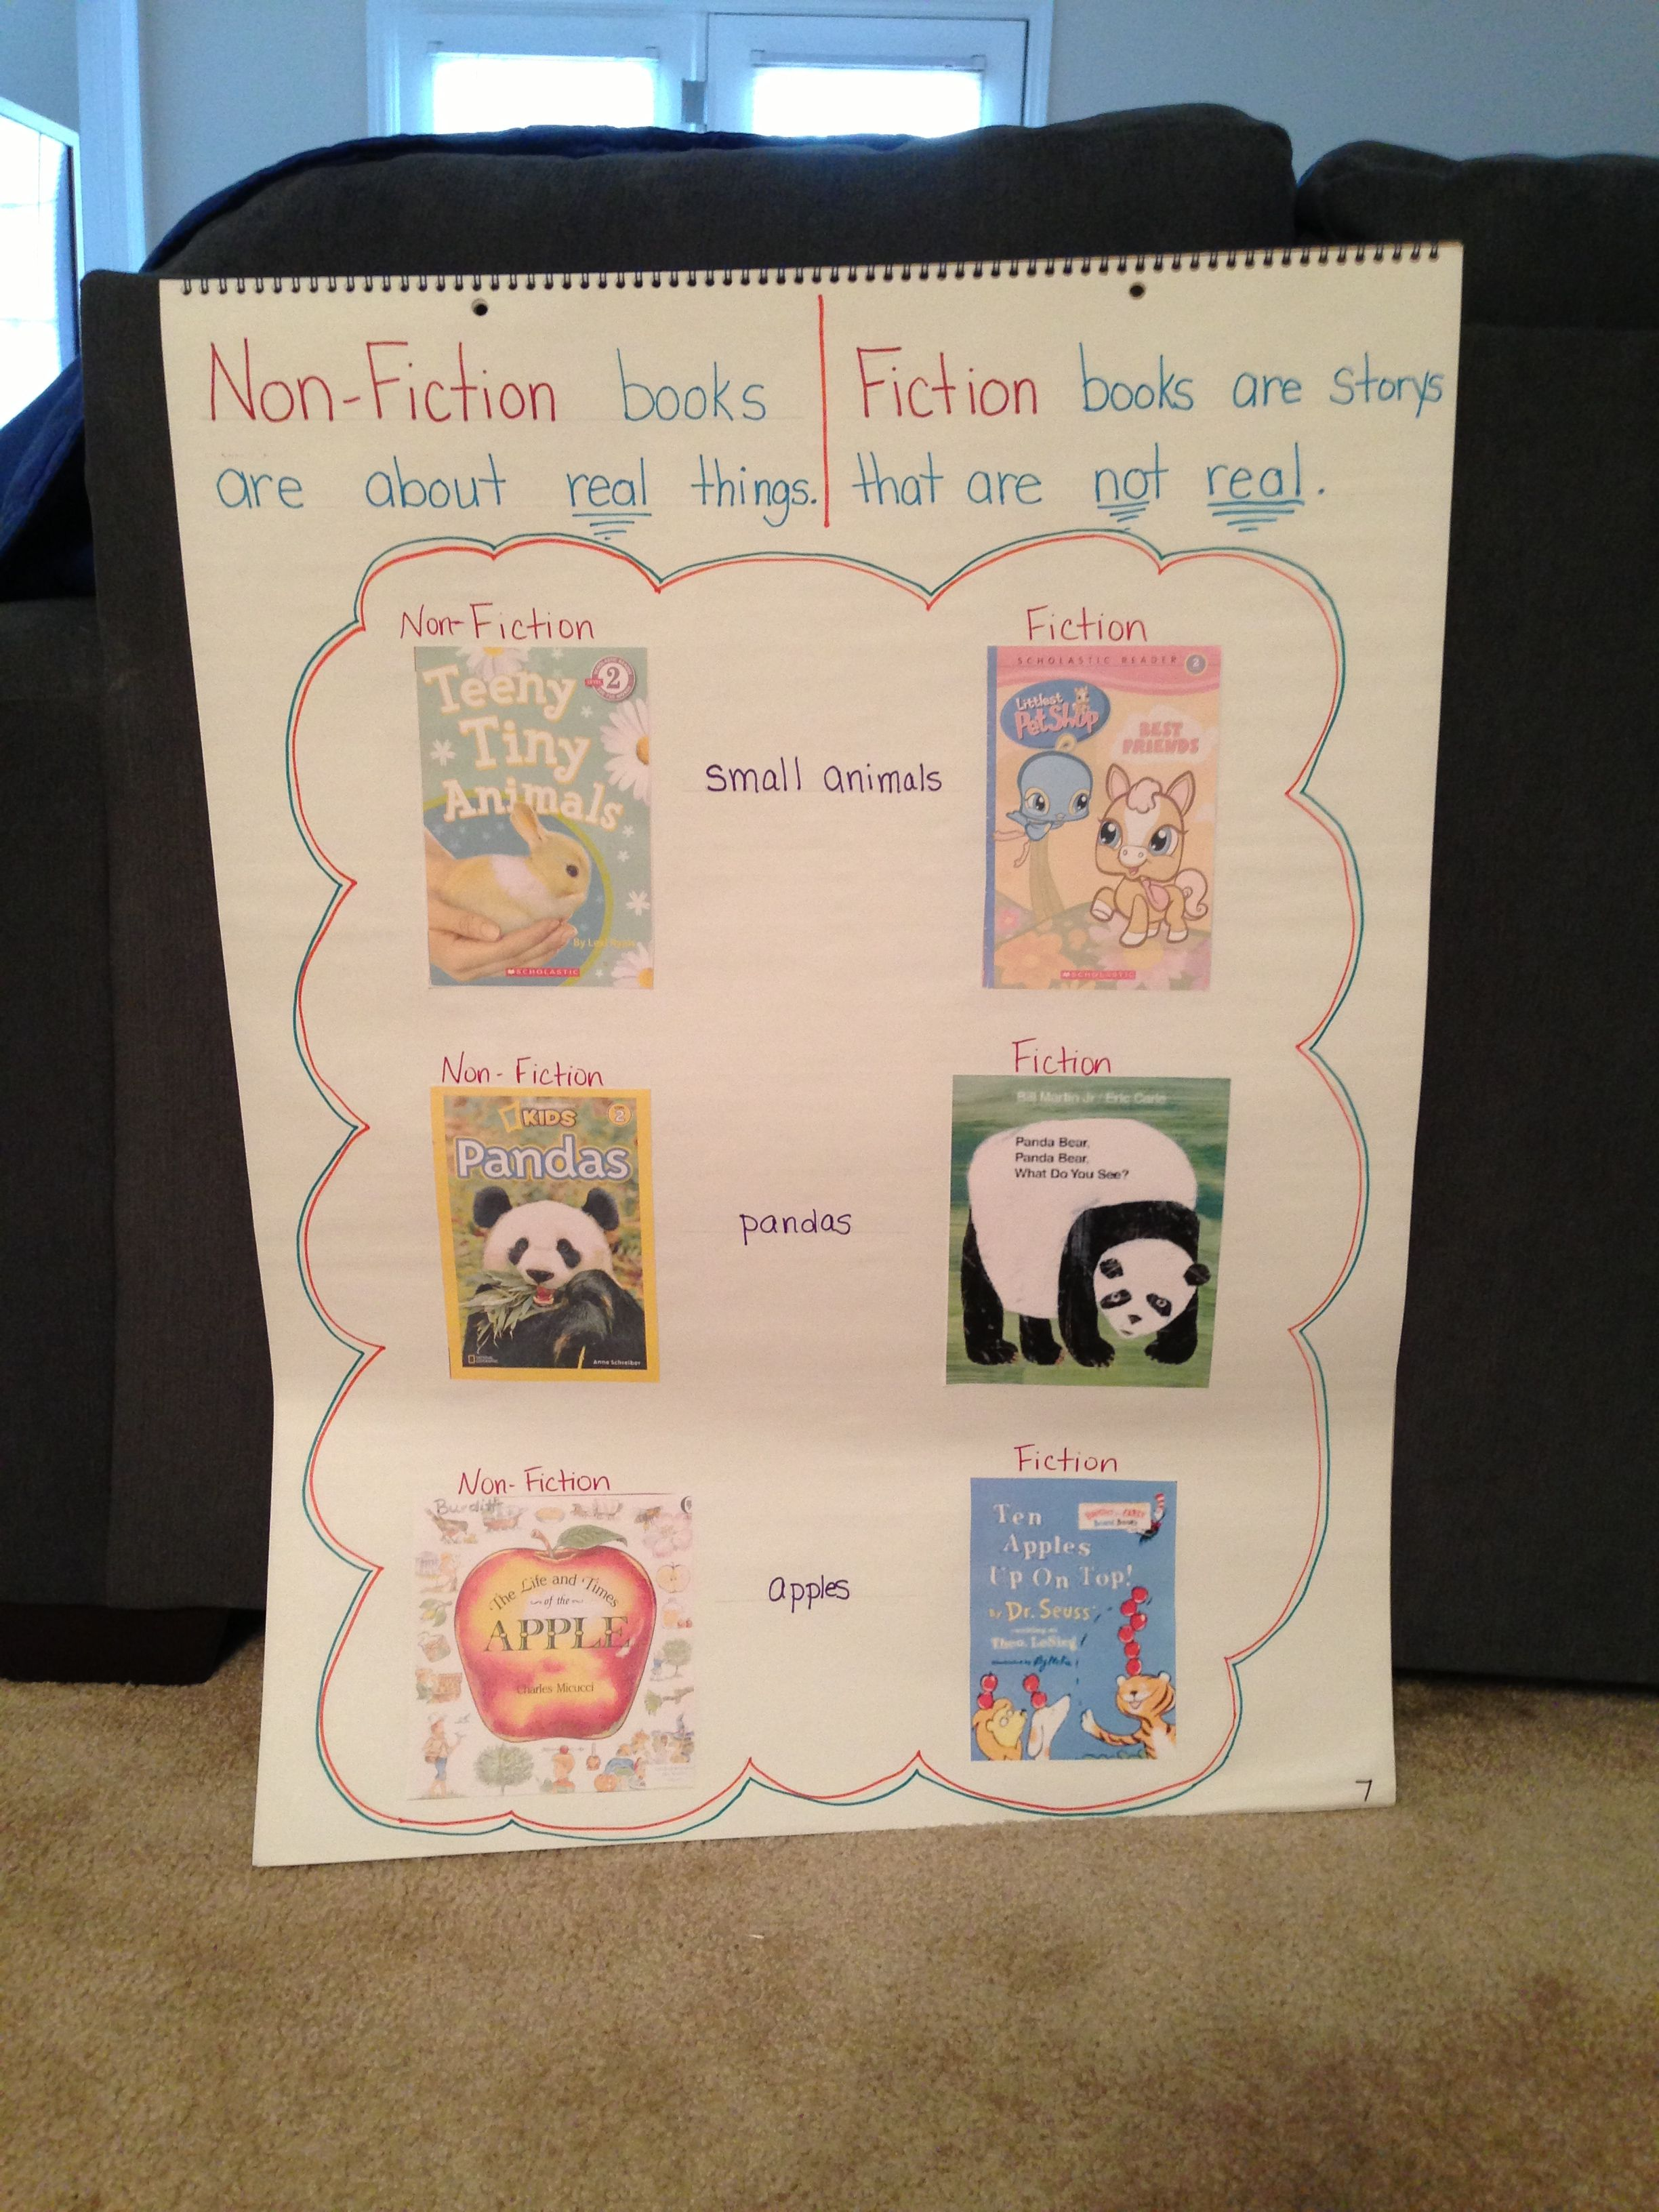 Fiction Vs Non Fiction Book Anchor Chart